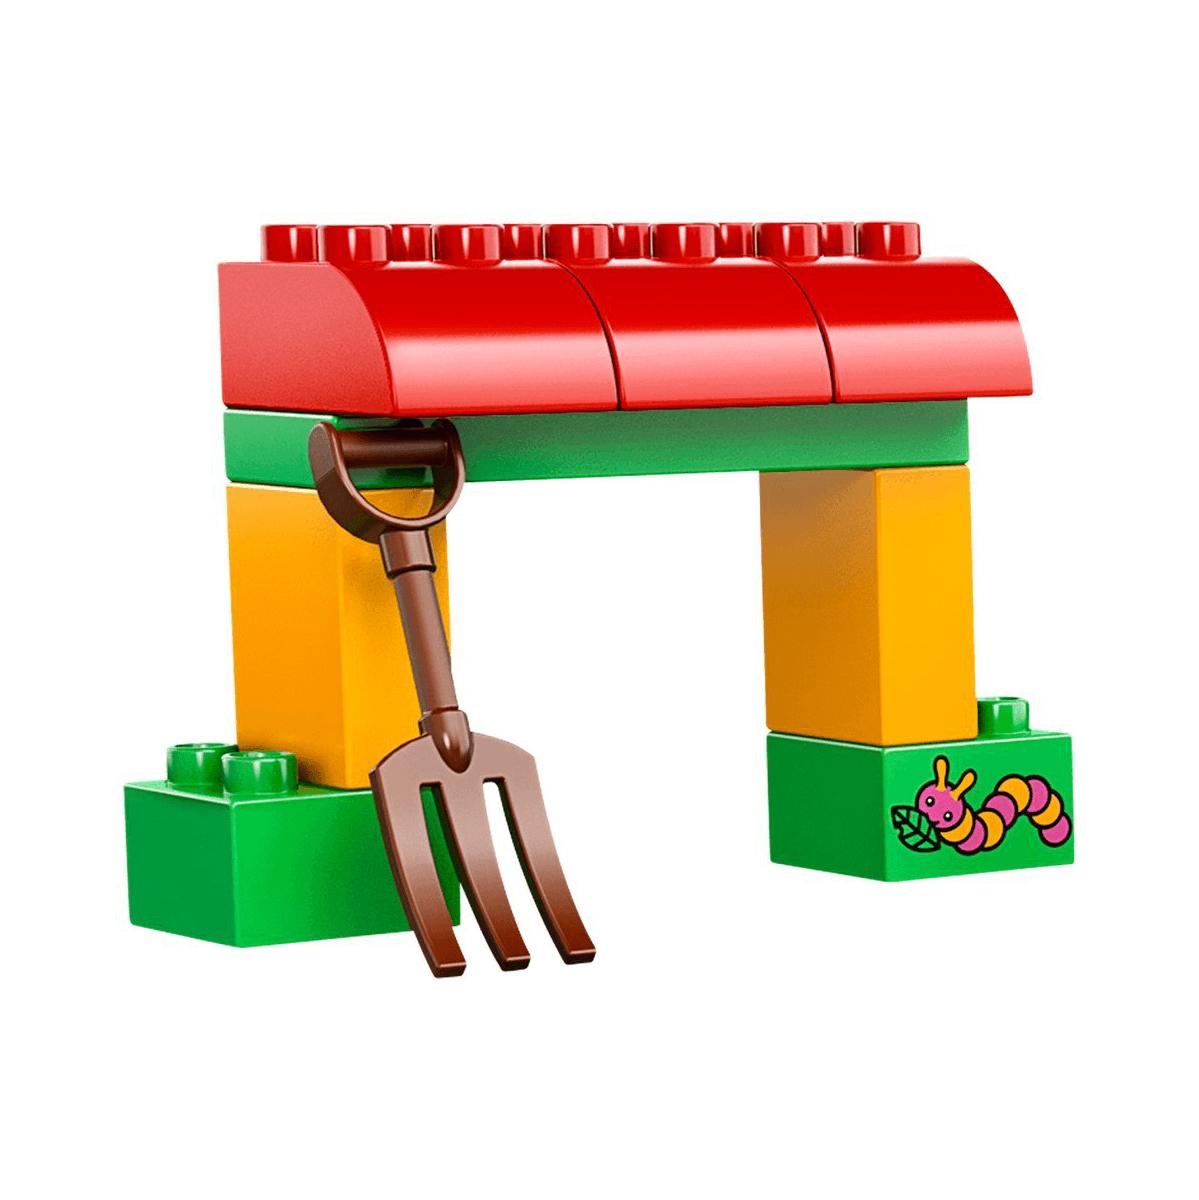 LEGO Duplo 10524